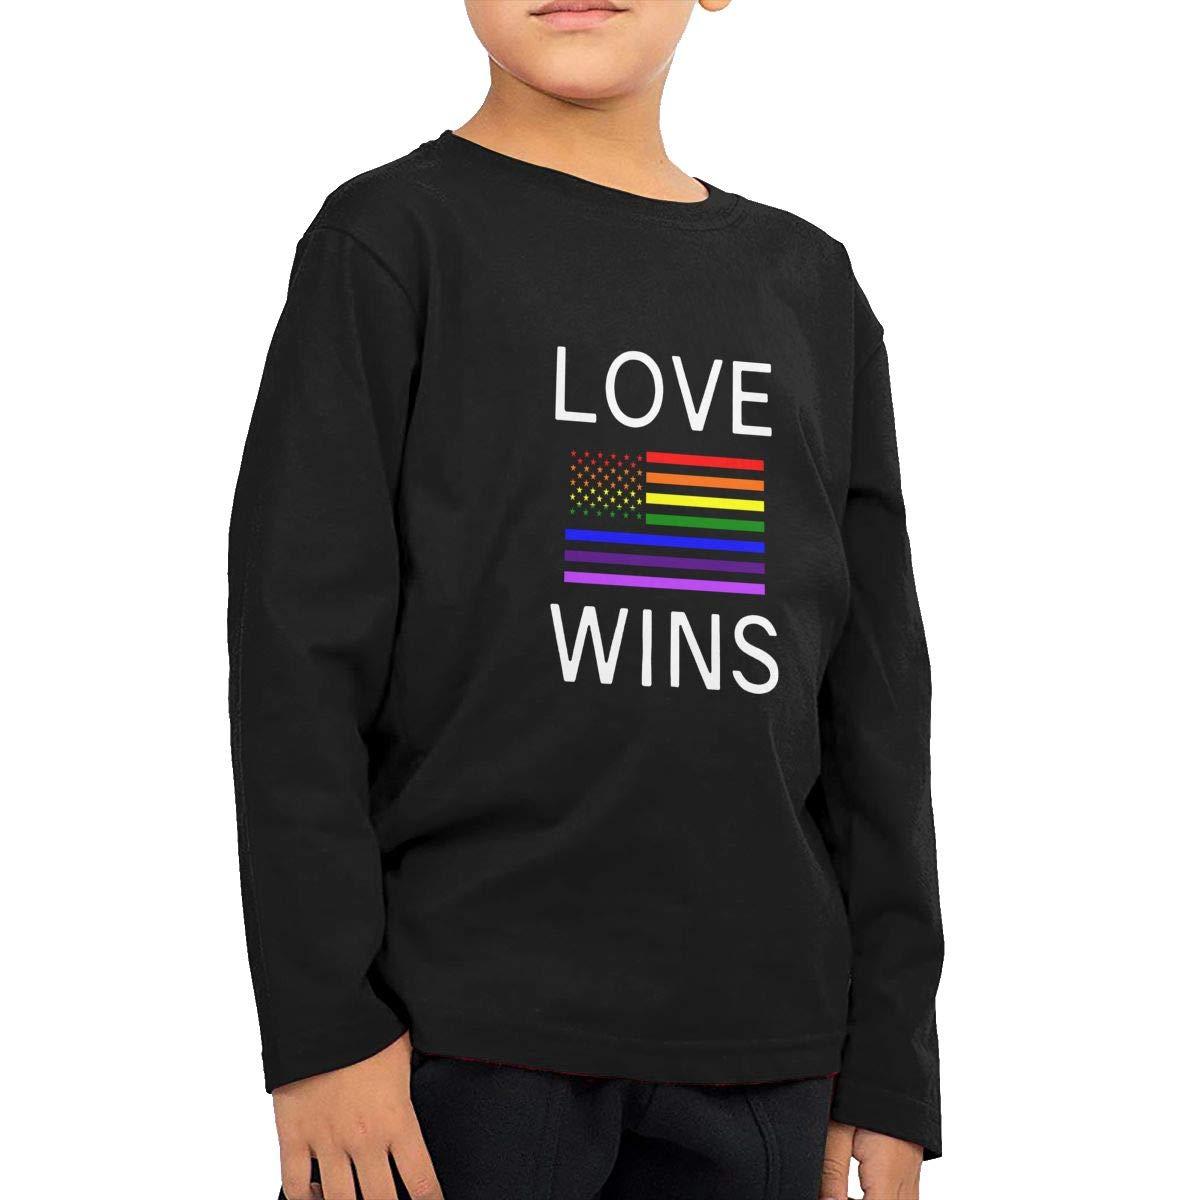 CERTONGCXTS Little Boys Lesbian Pride Shirts Gay ComfortSoft Long Sleeve Shirt